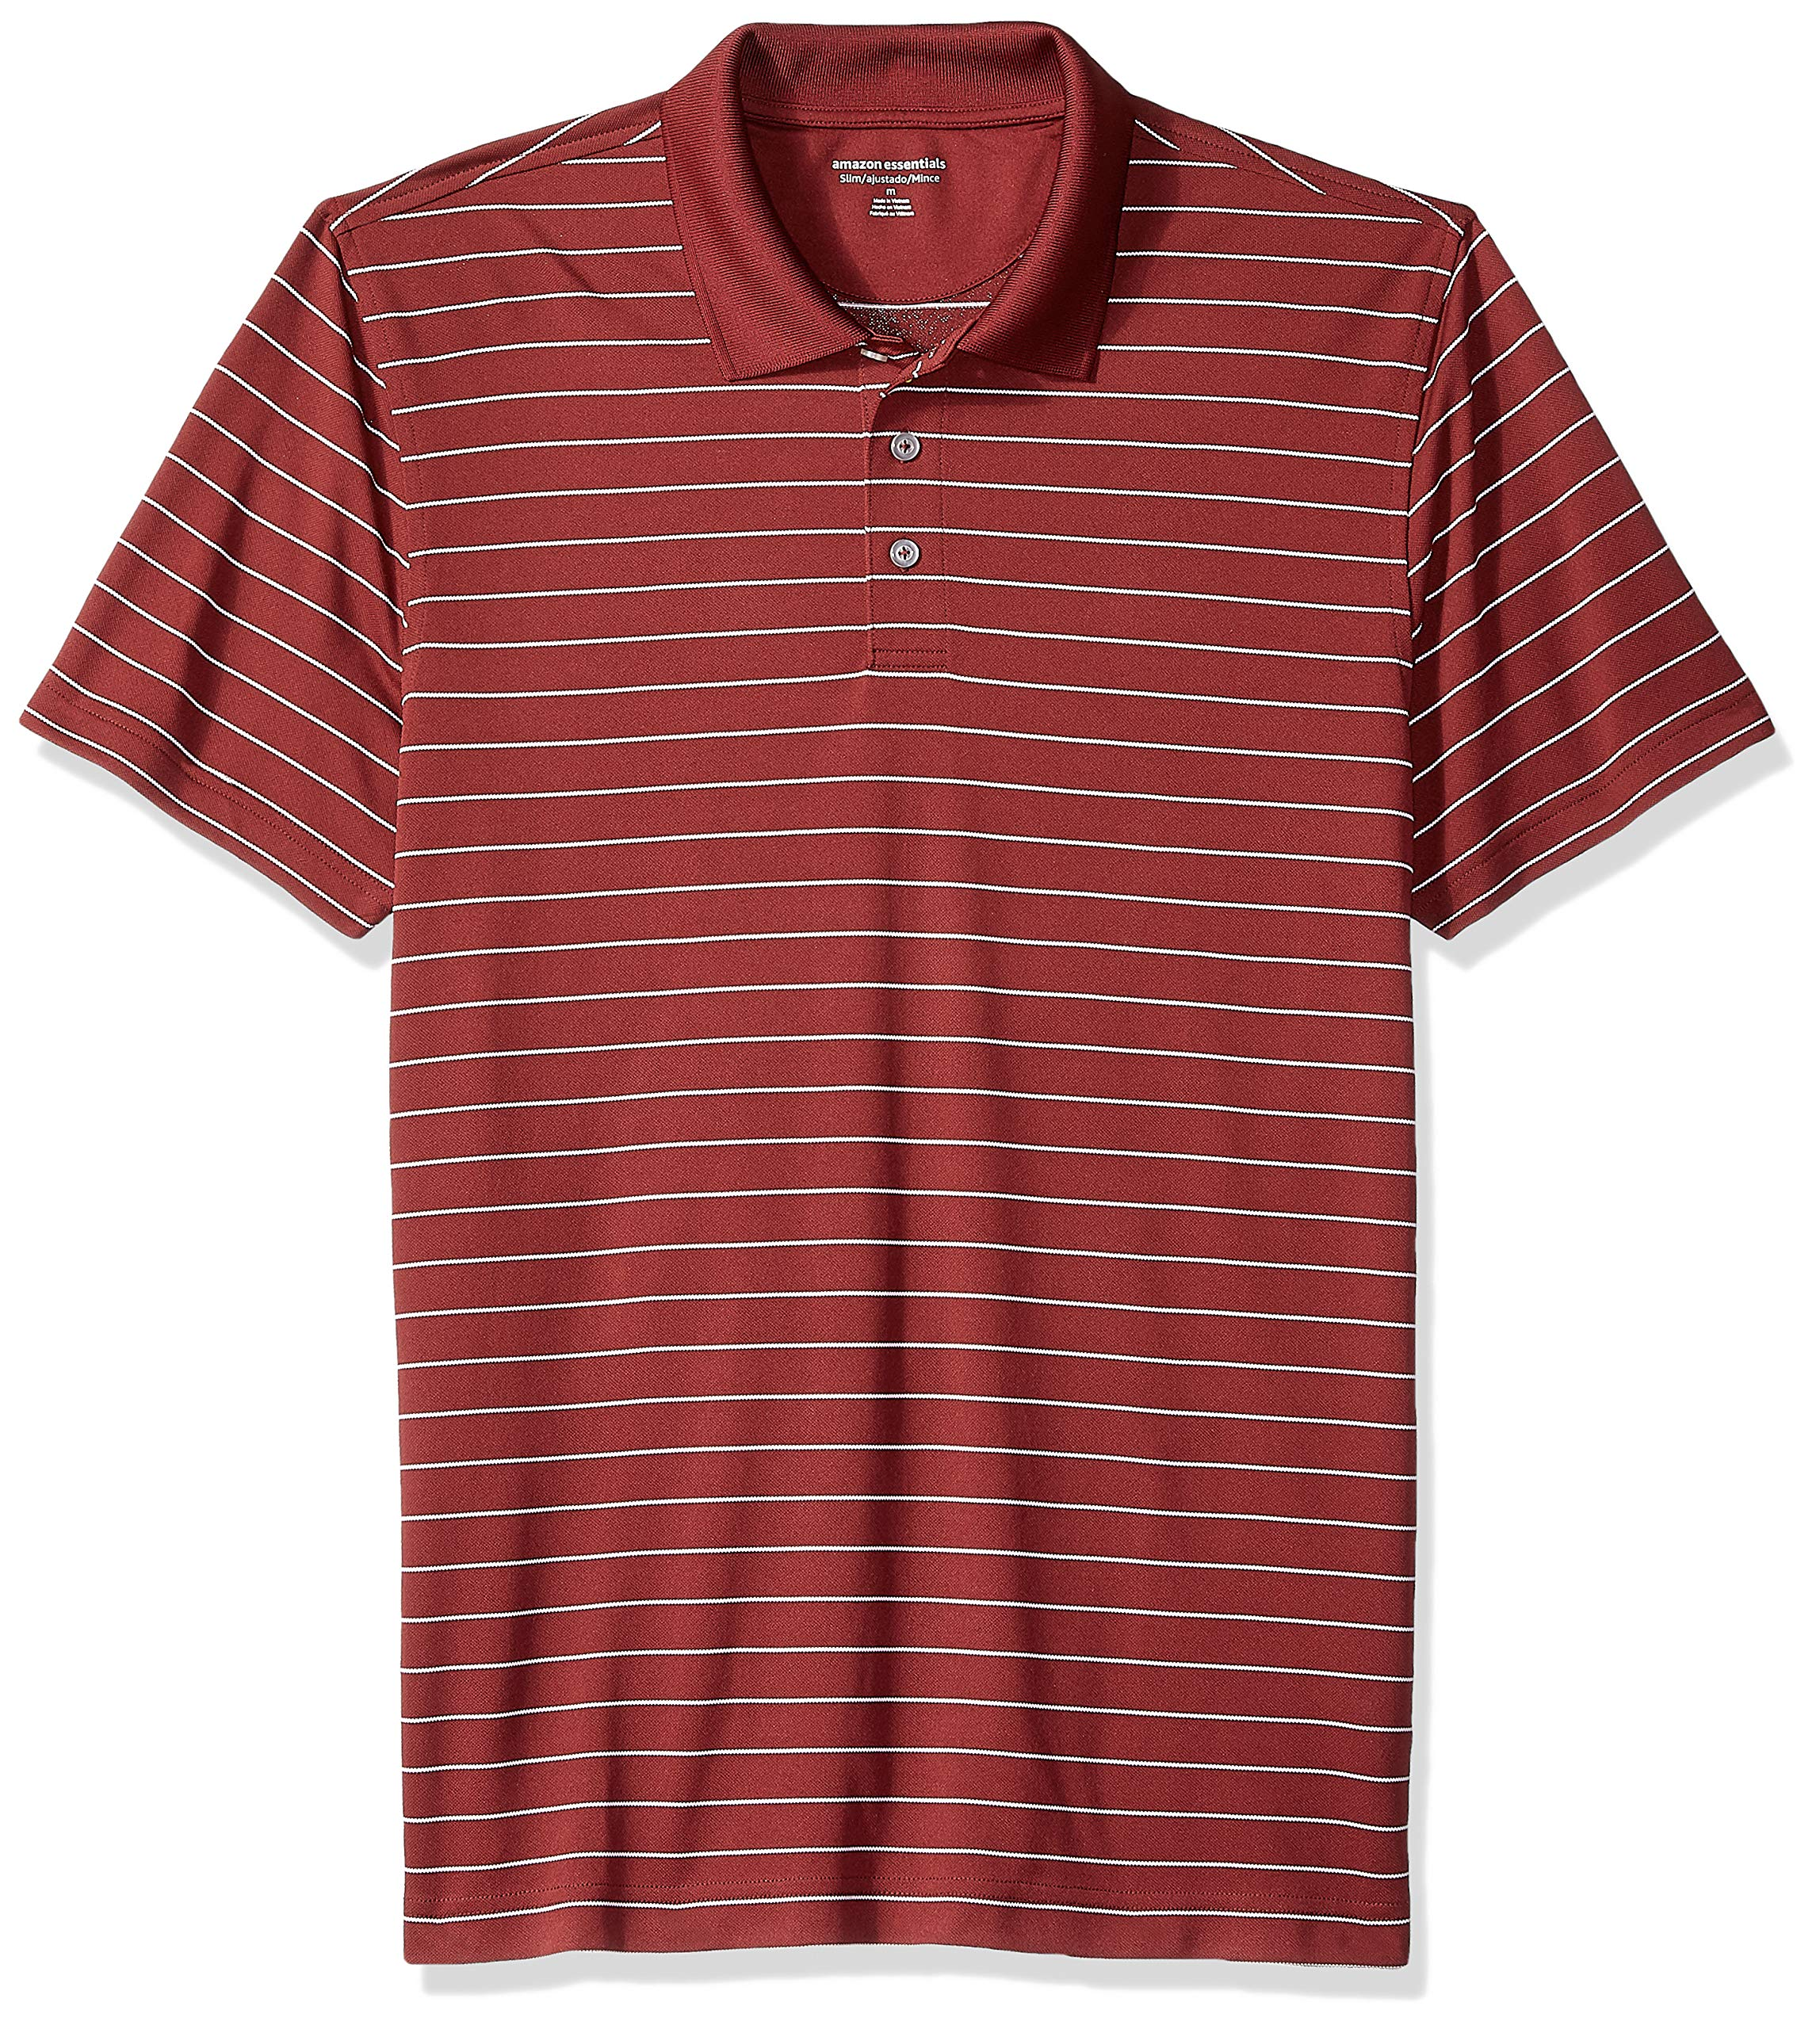 Amazon Essentials Men's Slim-Fit Quick-Dry Golf Polo Shirt, Port Stripe, X-Small